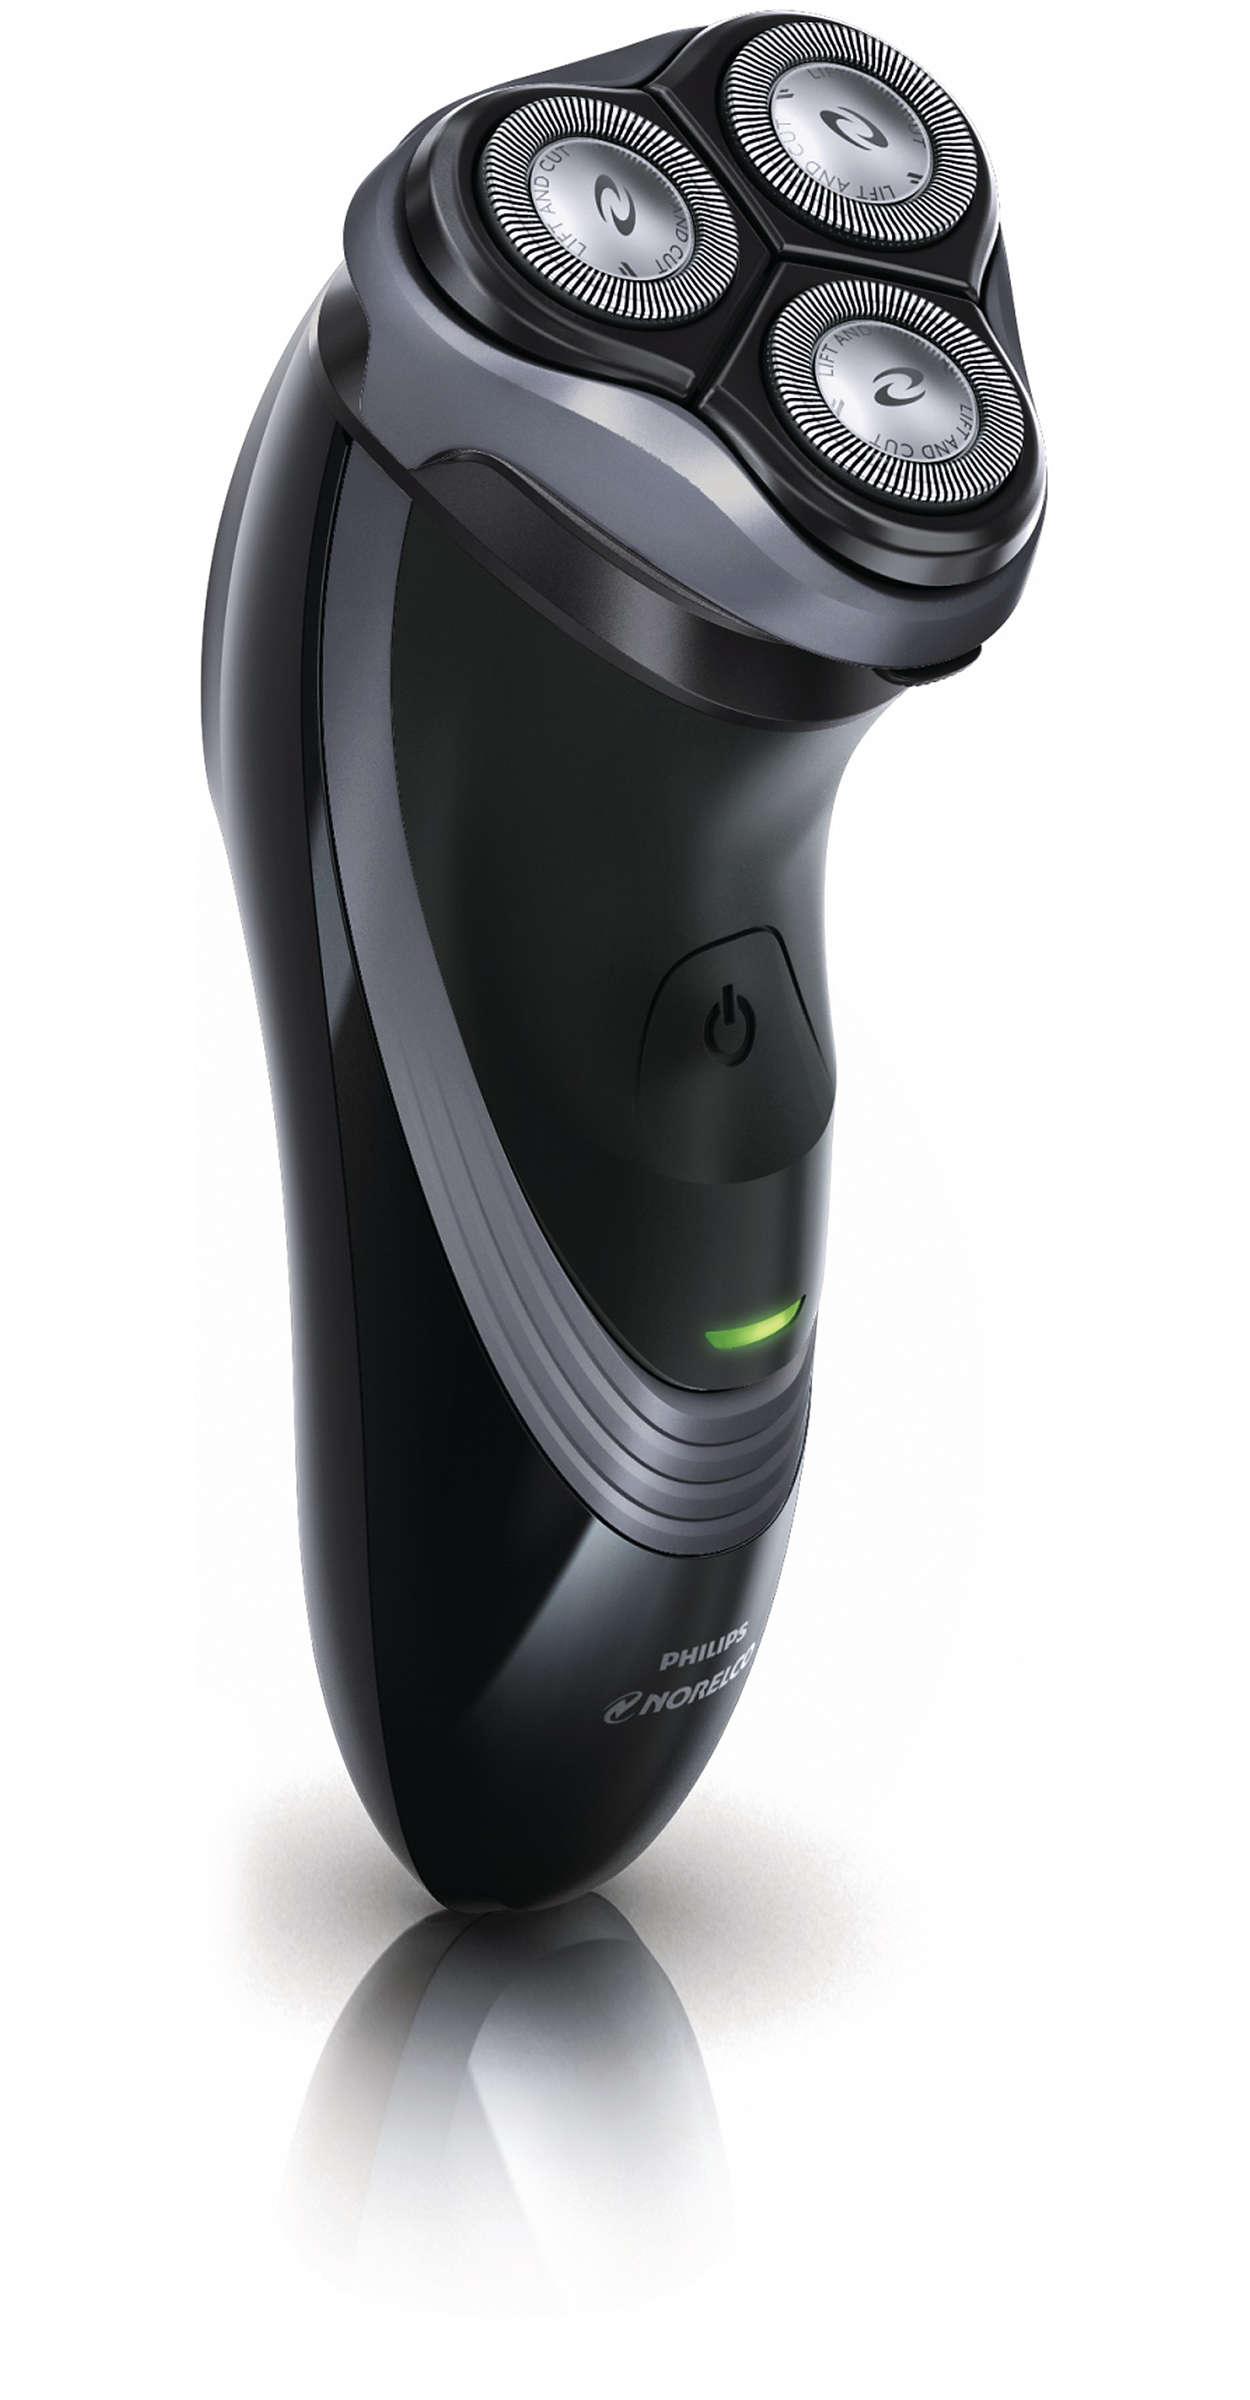 ComfortCut, rasatura confortevole